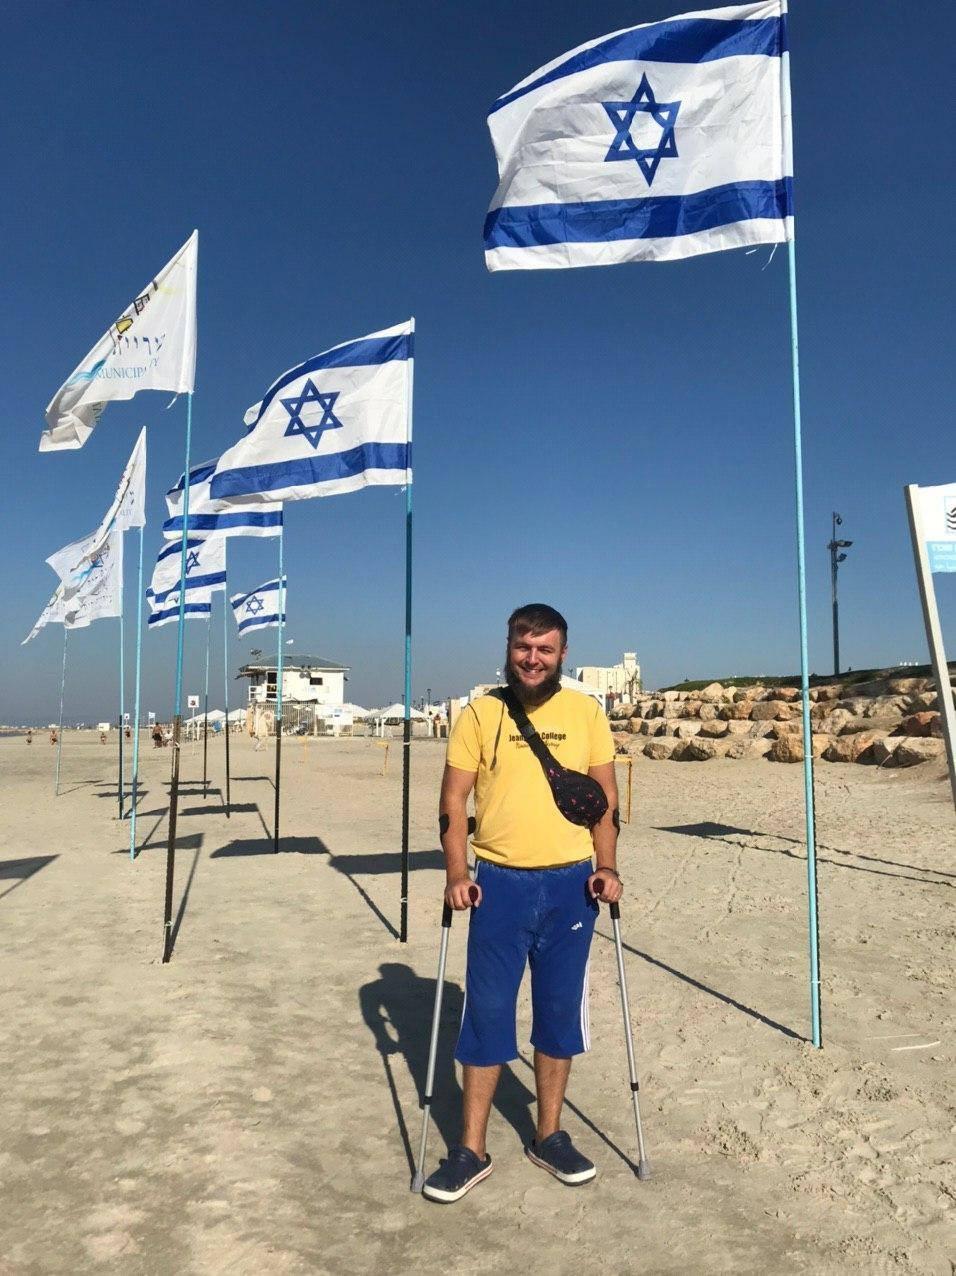 Oleh Andrew Pylypenko standing near a few Israeli flags